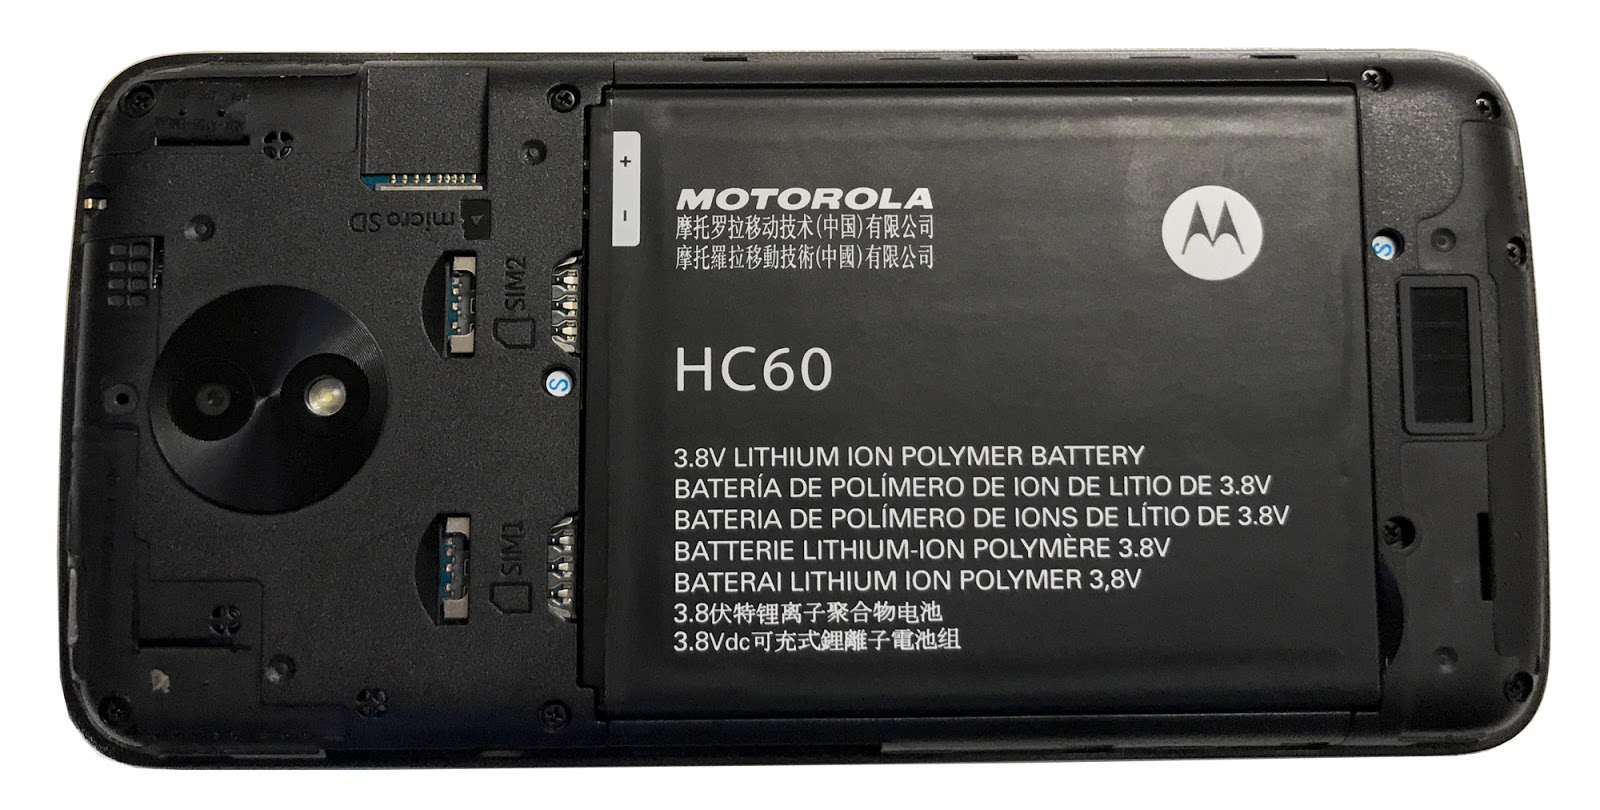 Обзор Motorola Moto C Plus — яркая новинка - 12